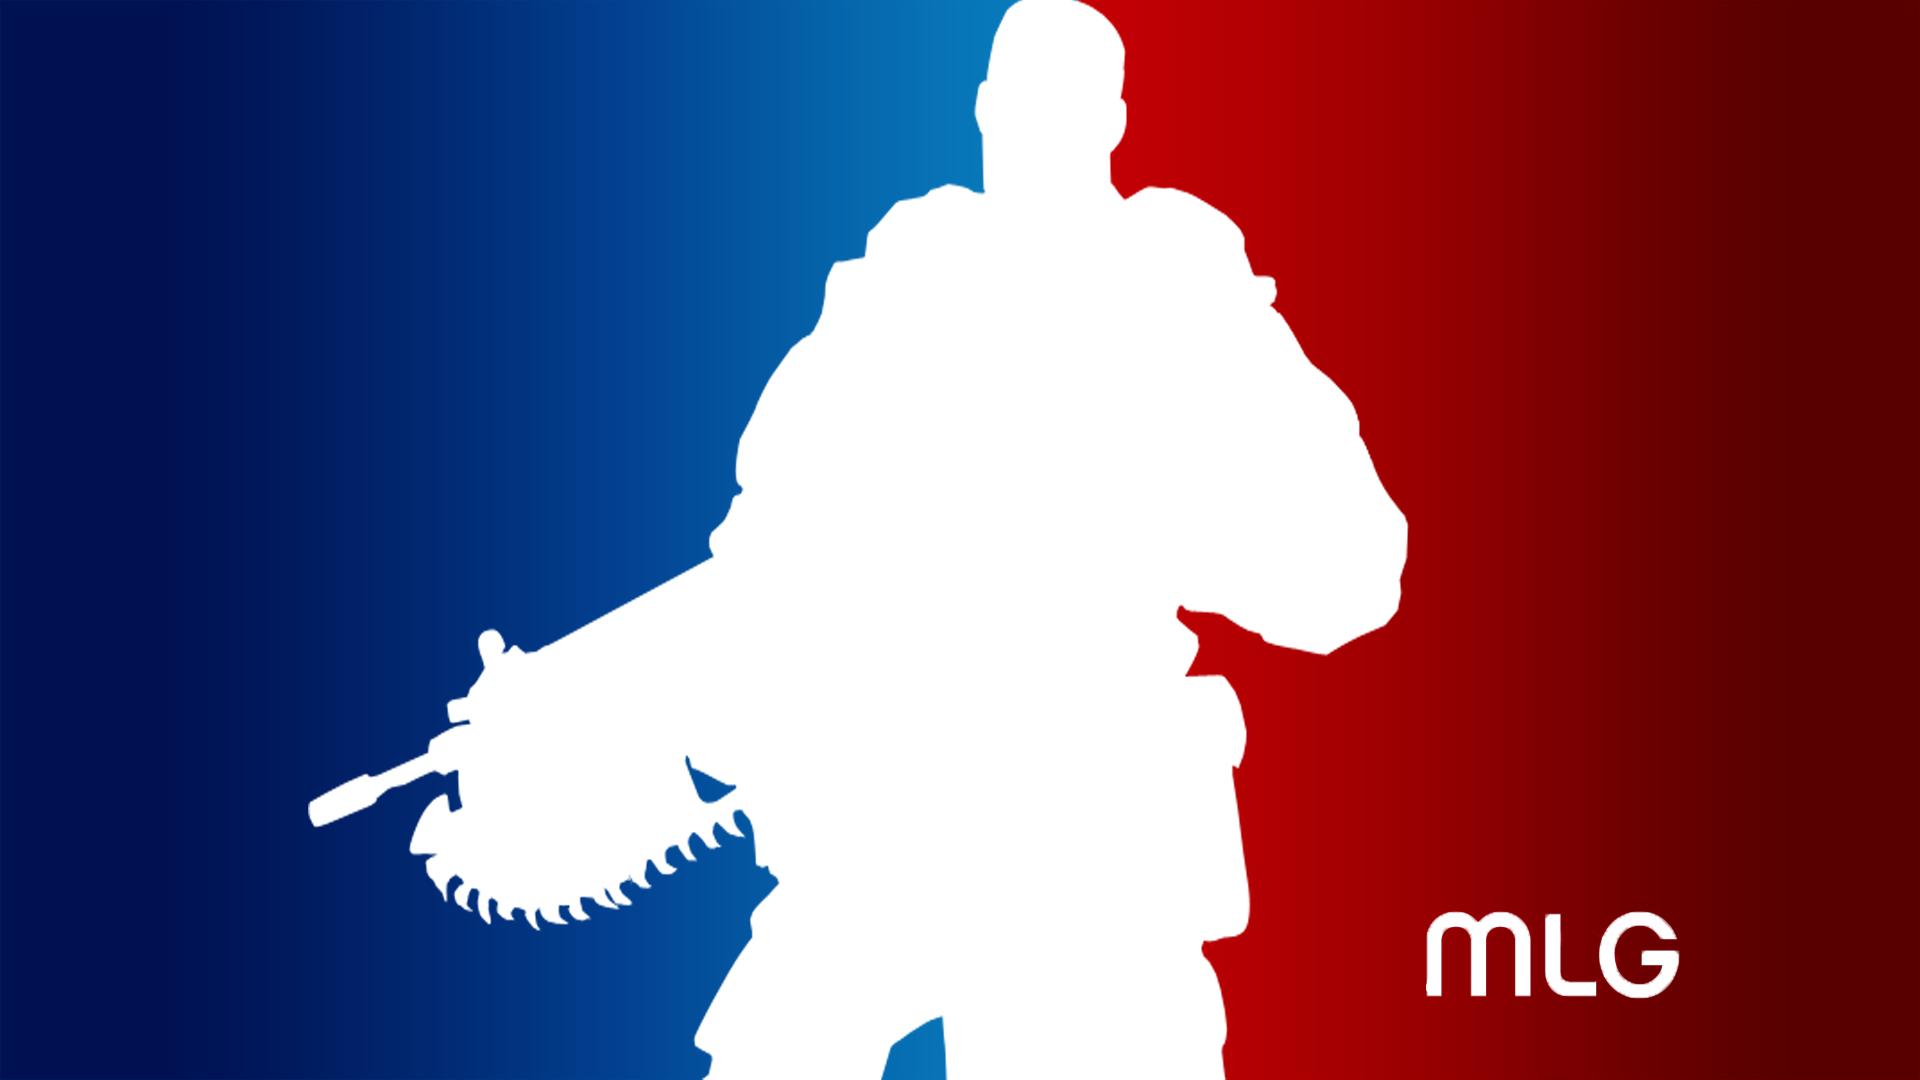 Gears Of War Mlg Desktop Wallpaper Ipod Wallpaper Gears Of War 3 Gears Of War